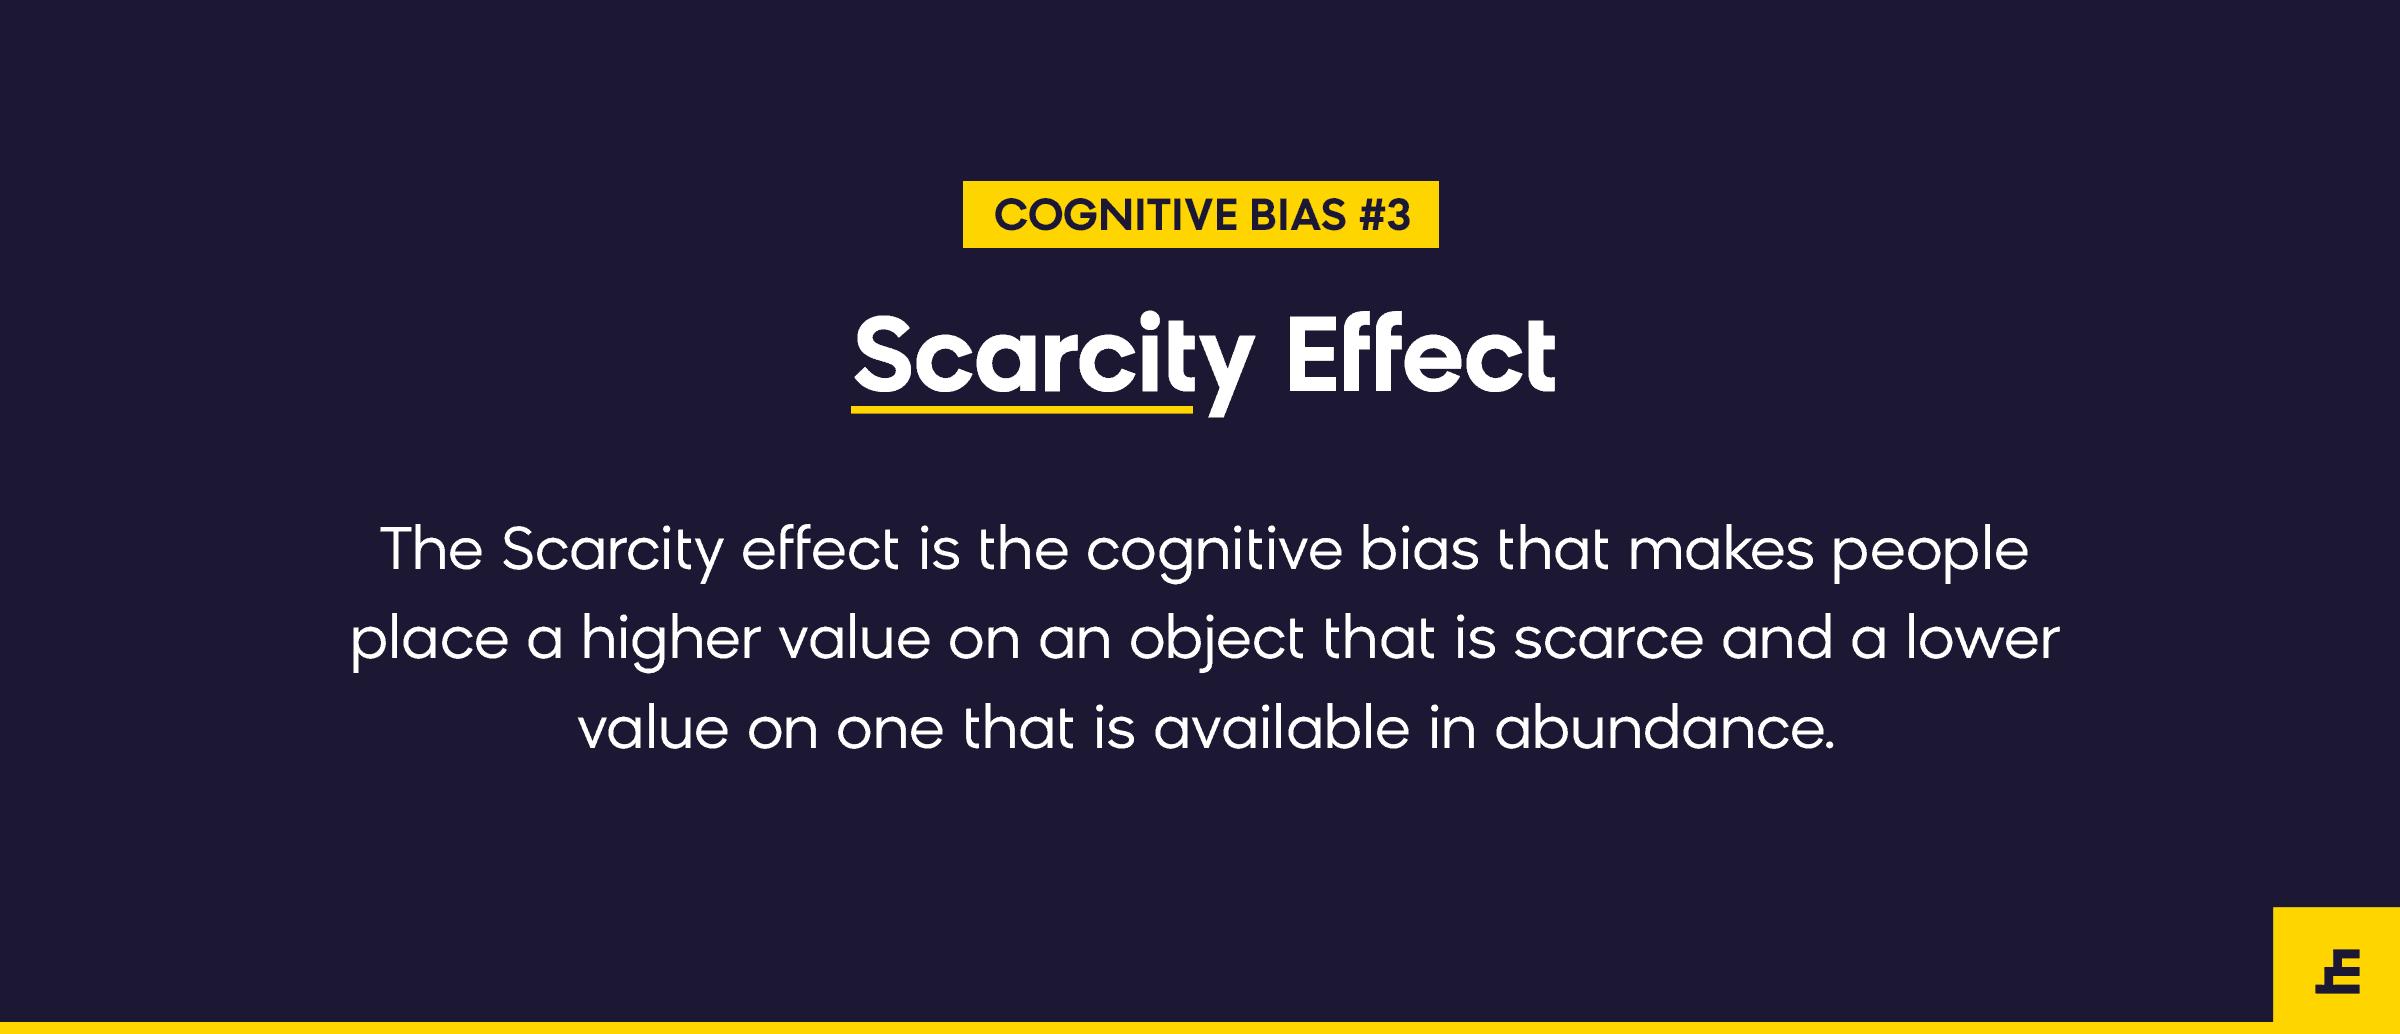 cognitive bias - scarcity effect